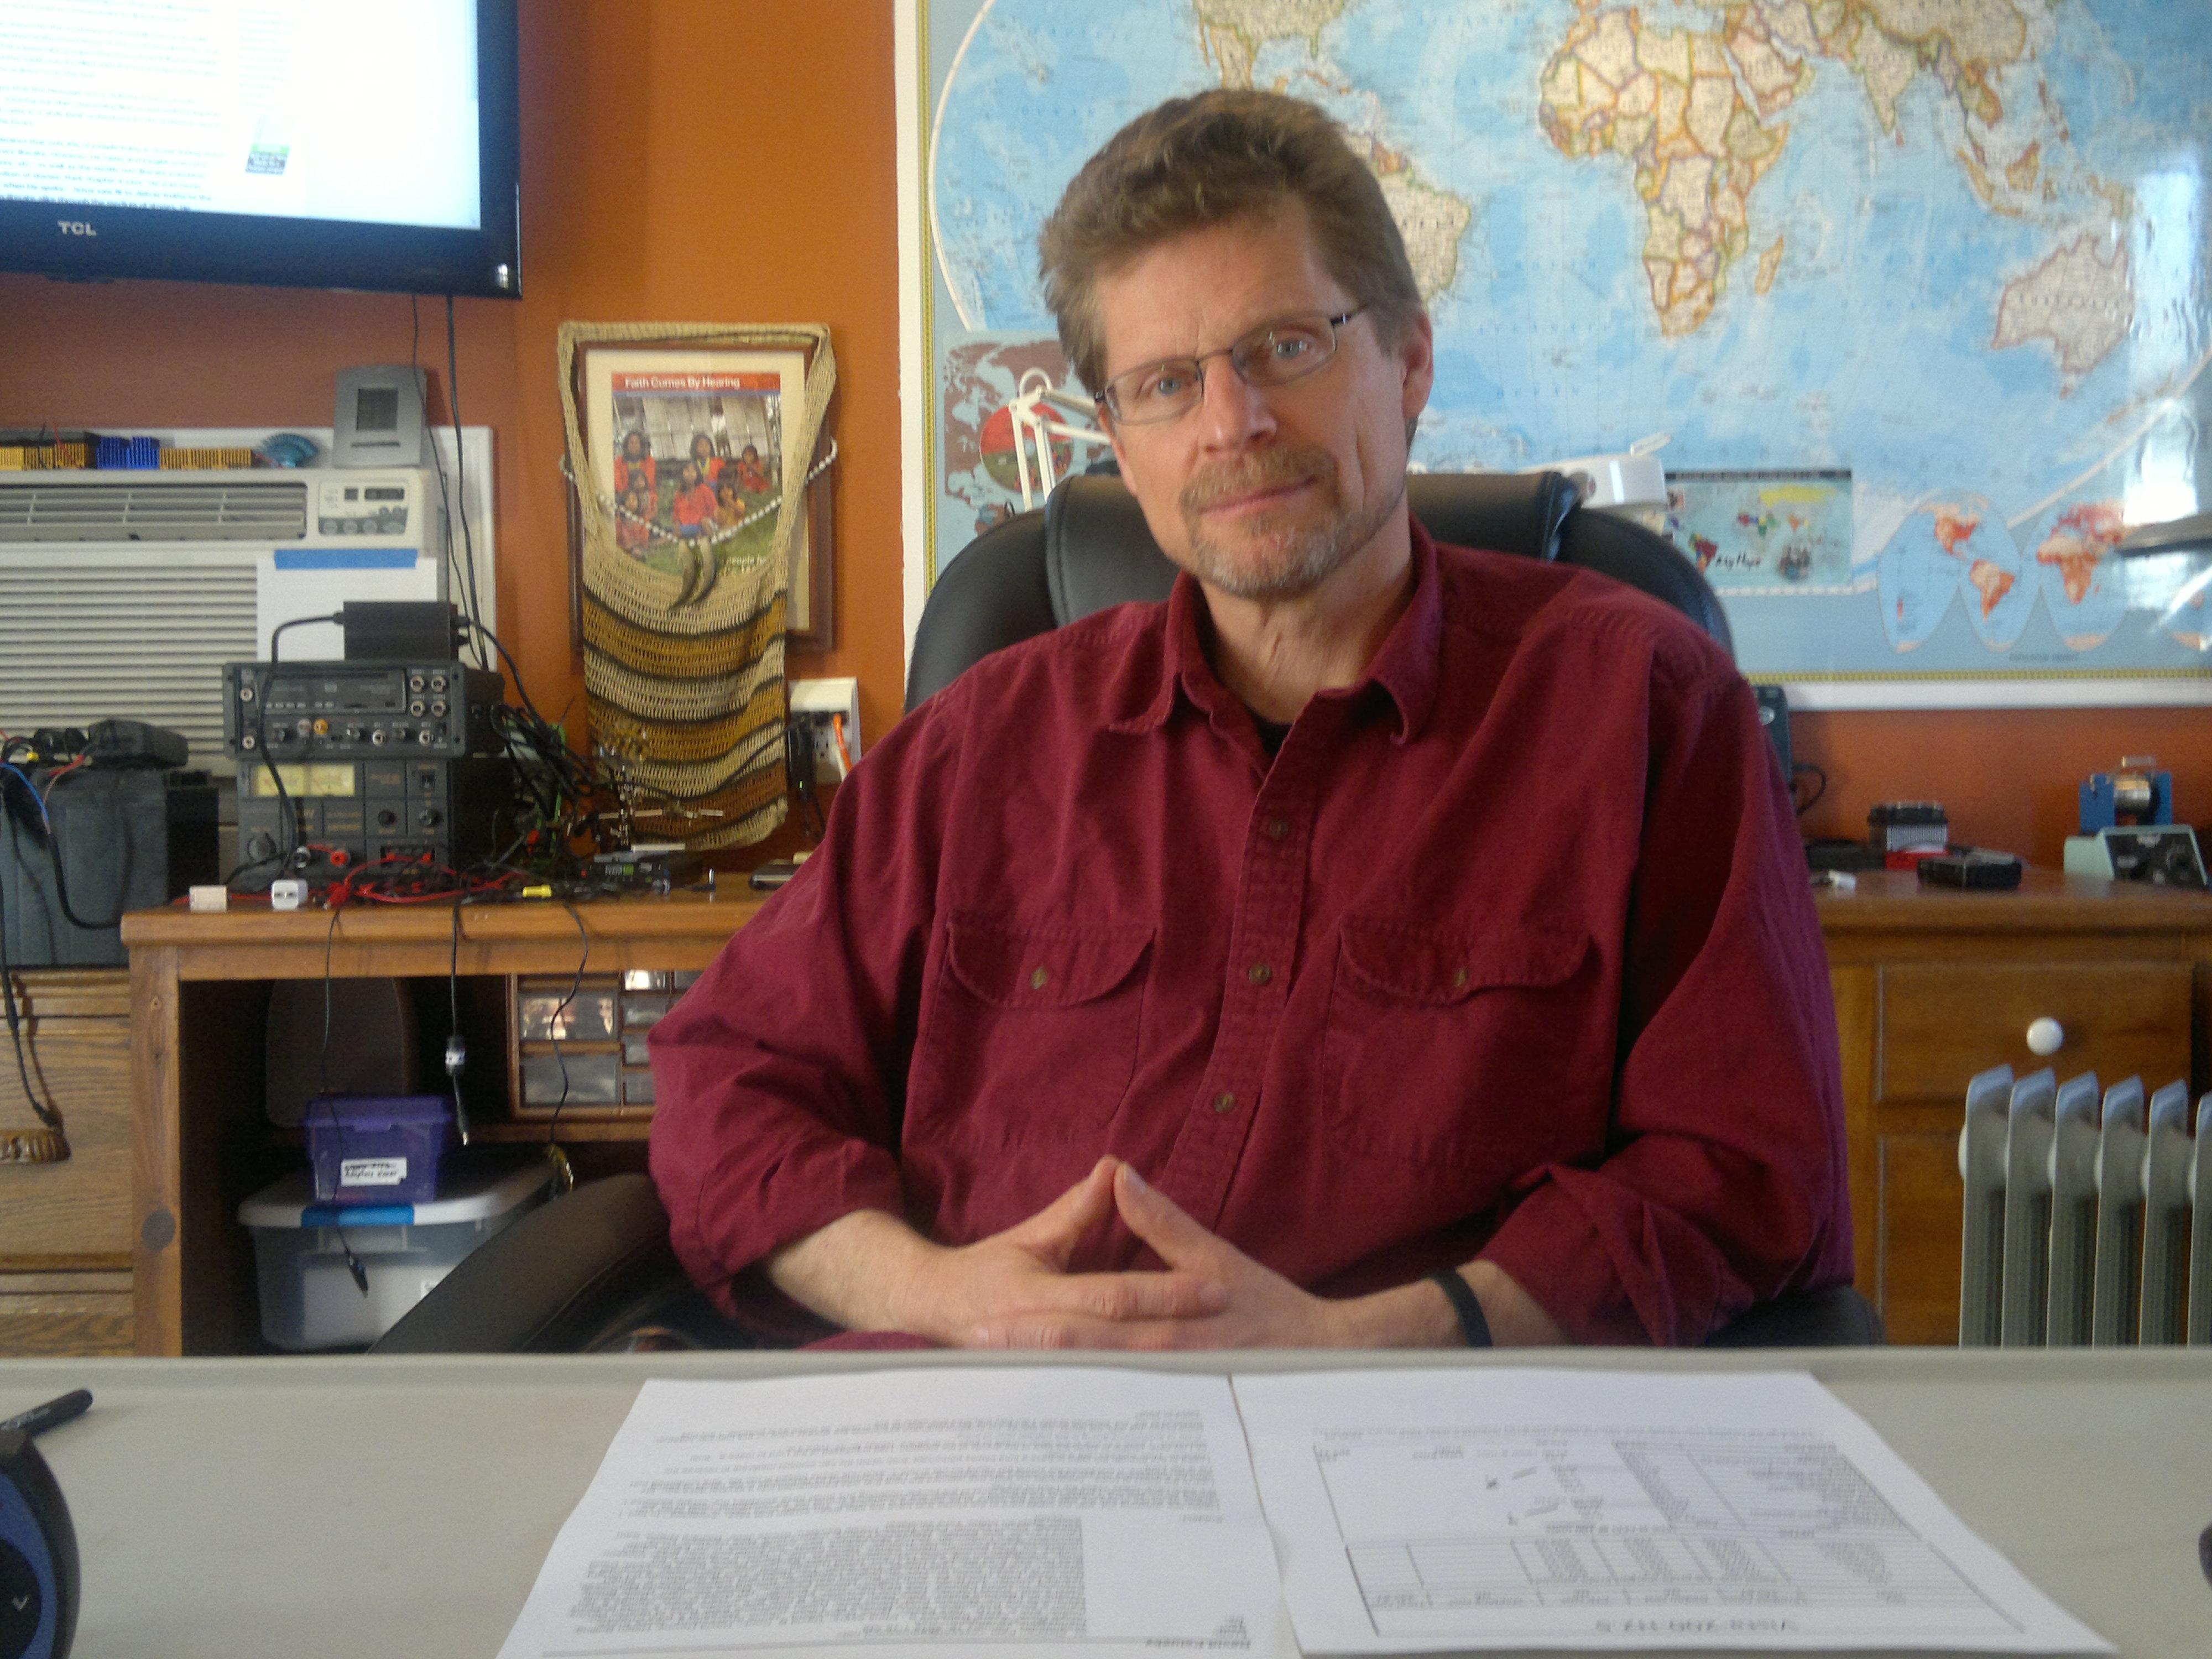 David Palusky, Renew Outreach